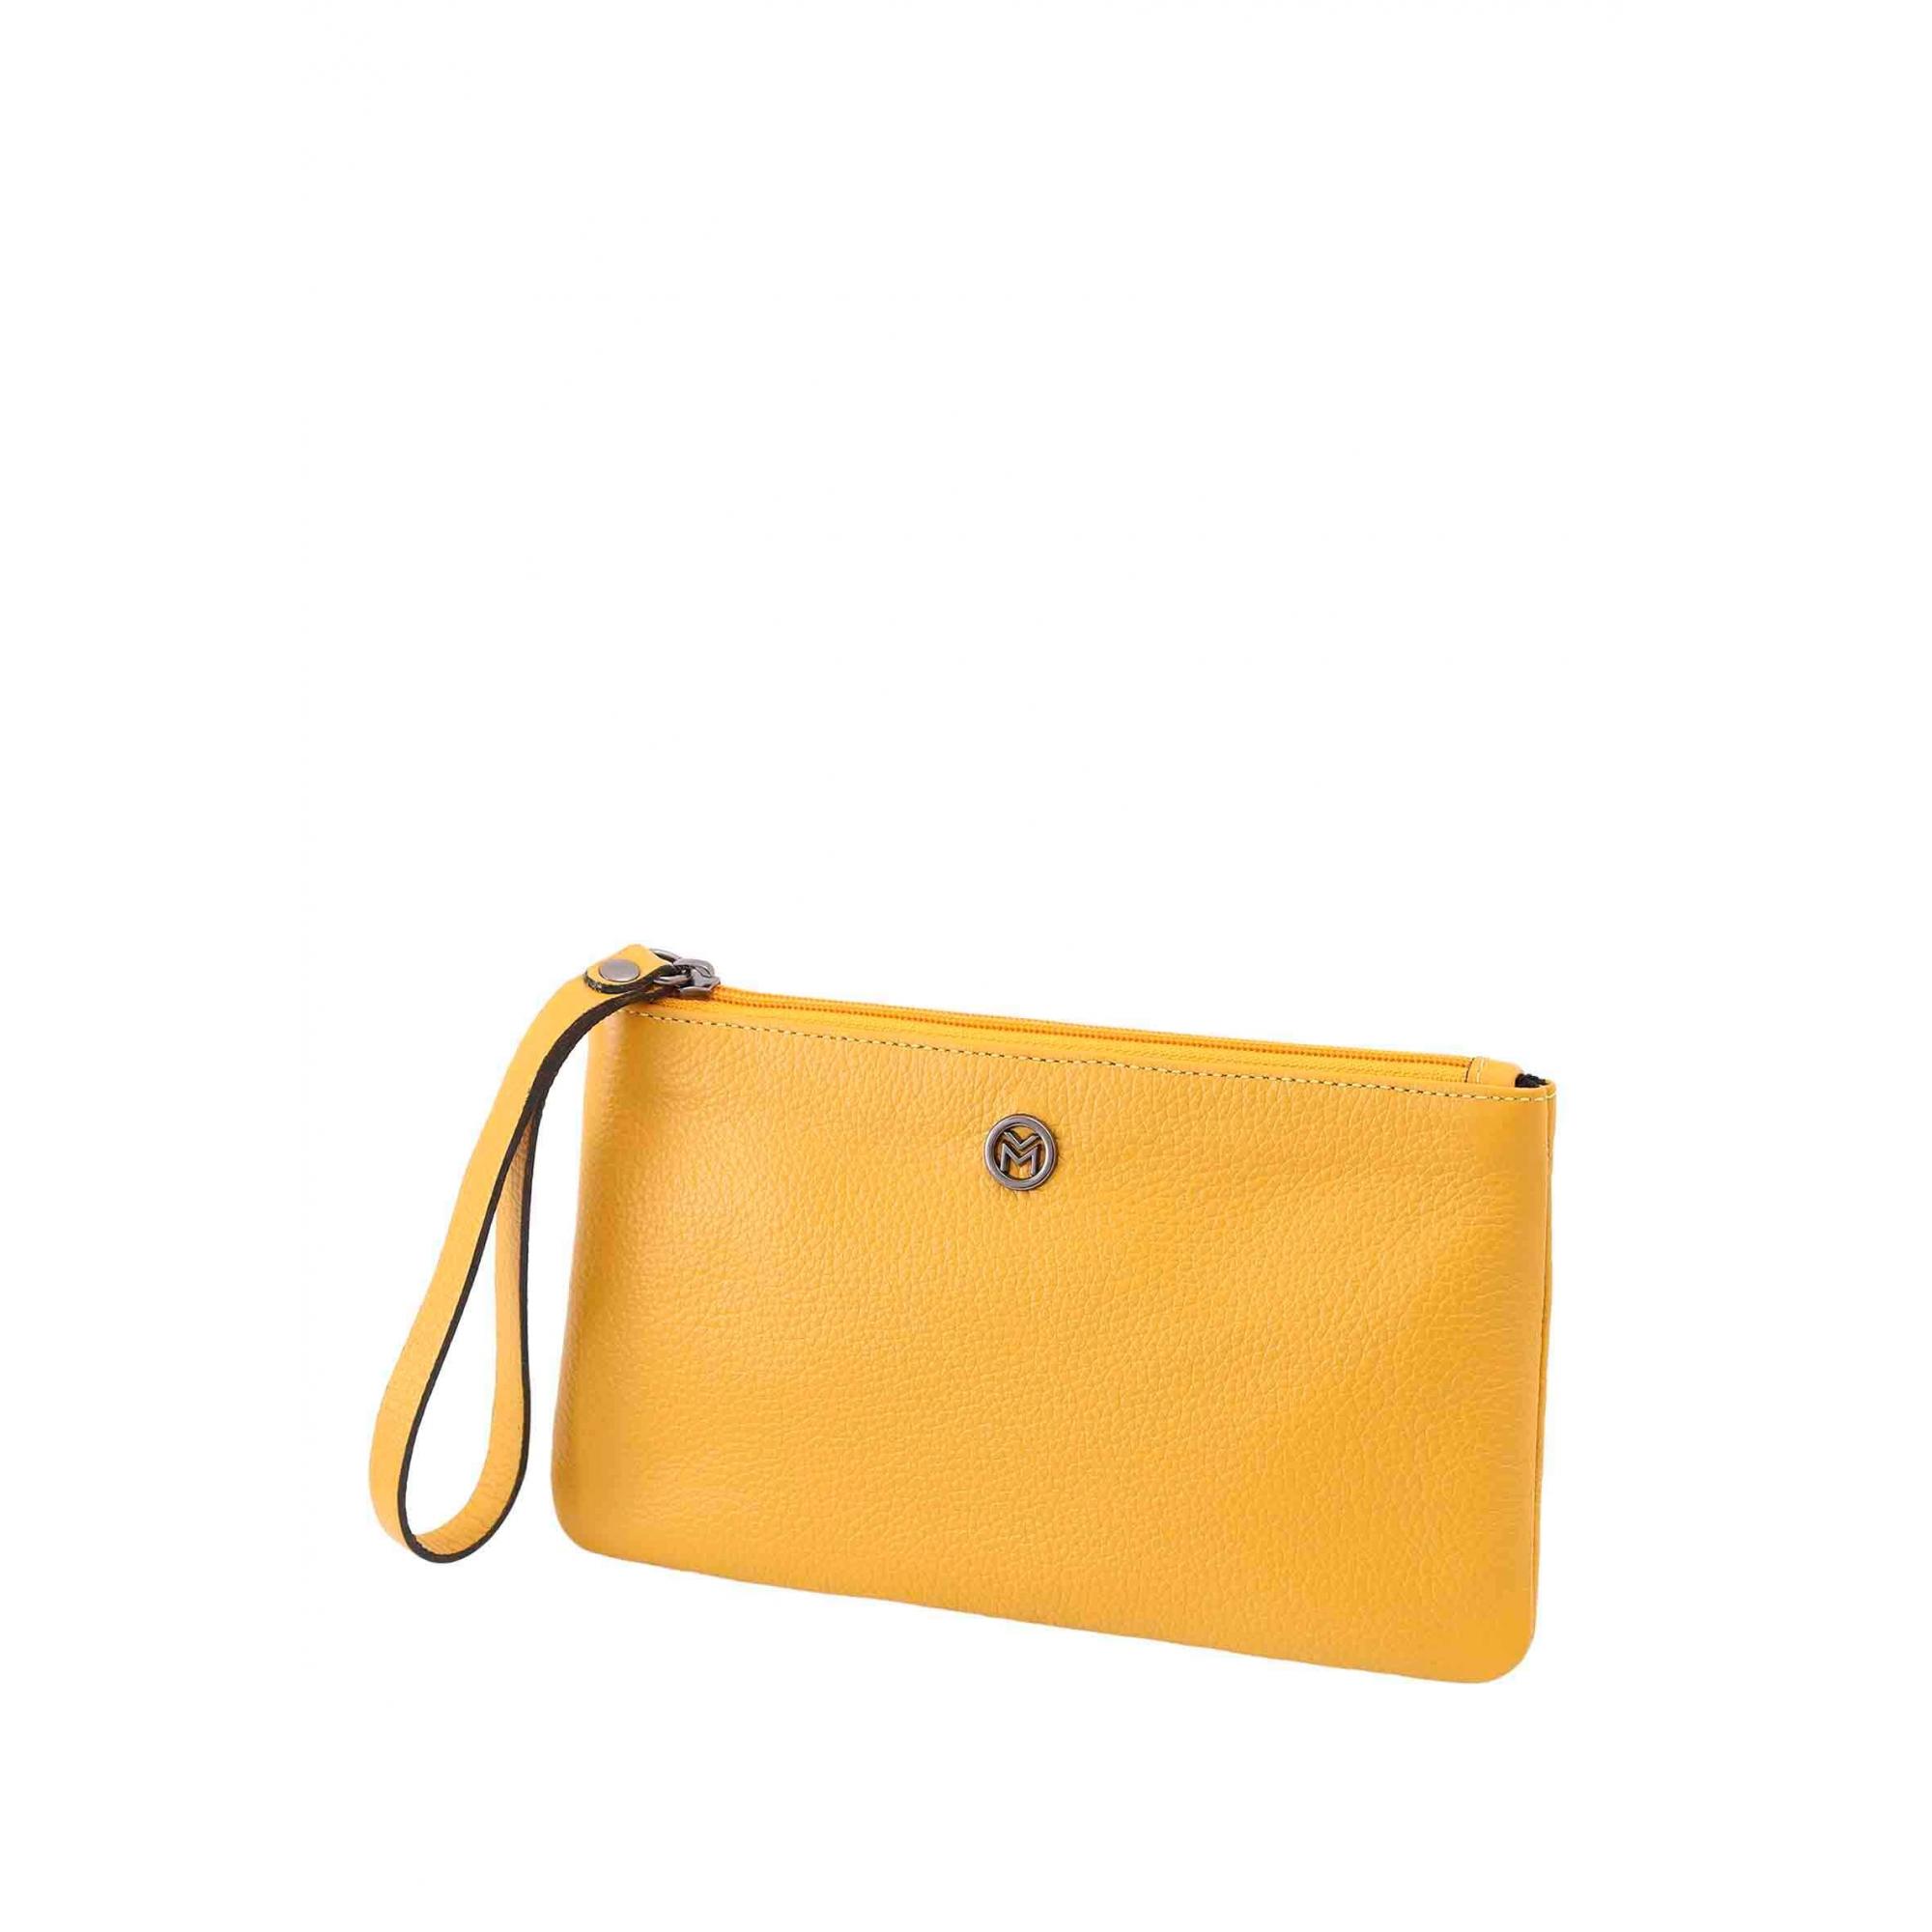 Bolsa Carteira Clutch Couro Mariart 263C Cores Gold